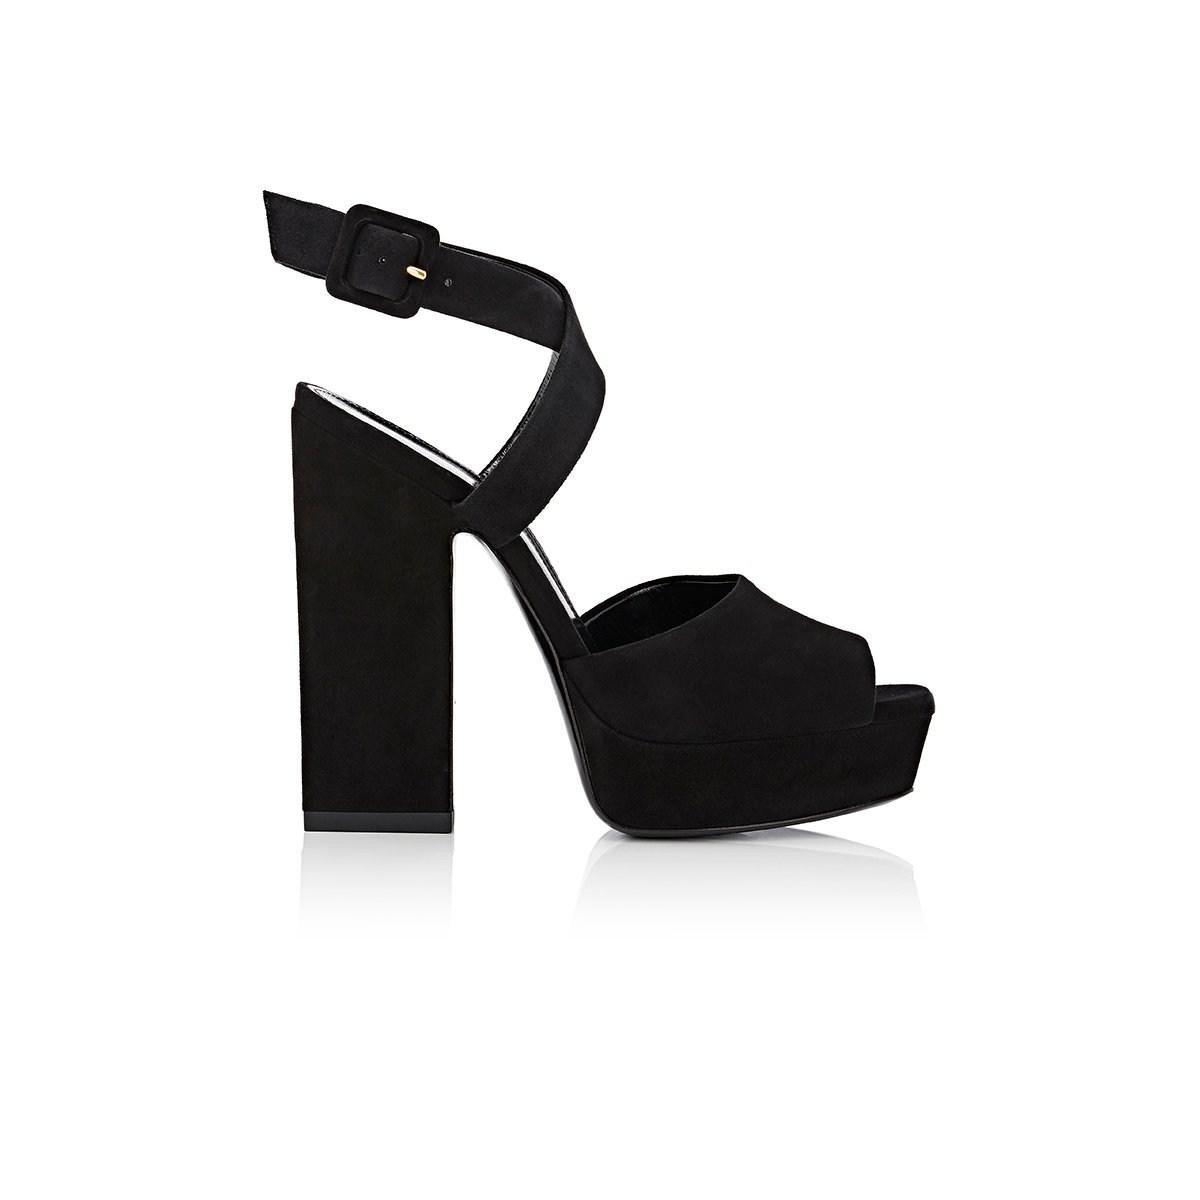 11c13f9f72b Saint Laurent Debbie Suede Platform Sandals in Black - Lyst